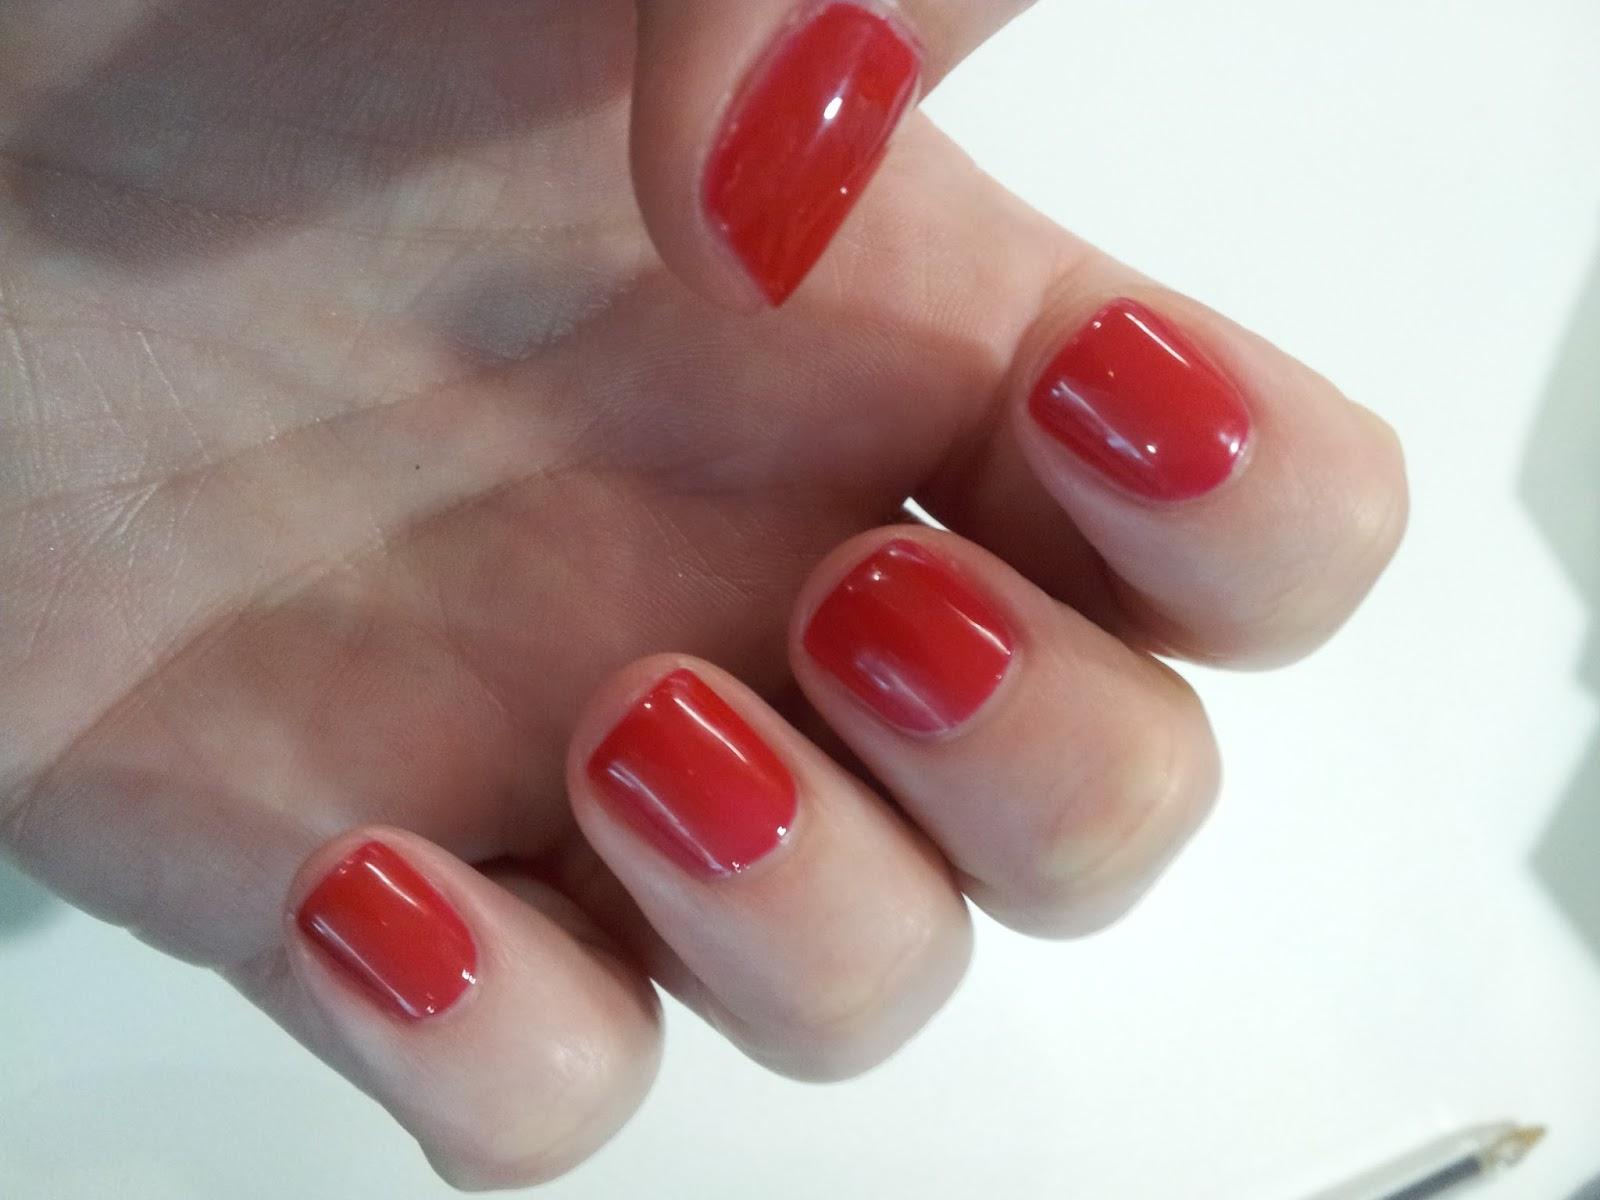 Jelly Apple Essie Nail Polish – Papillon Day Spa